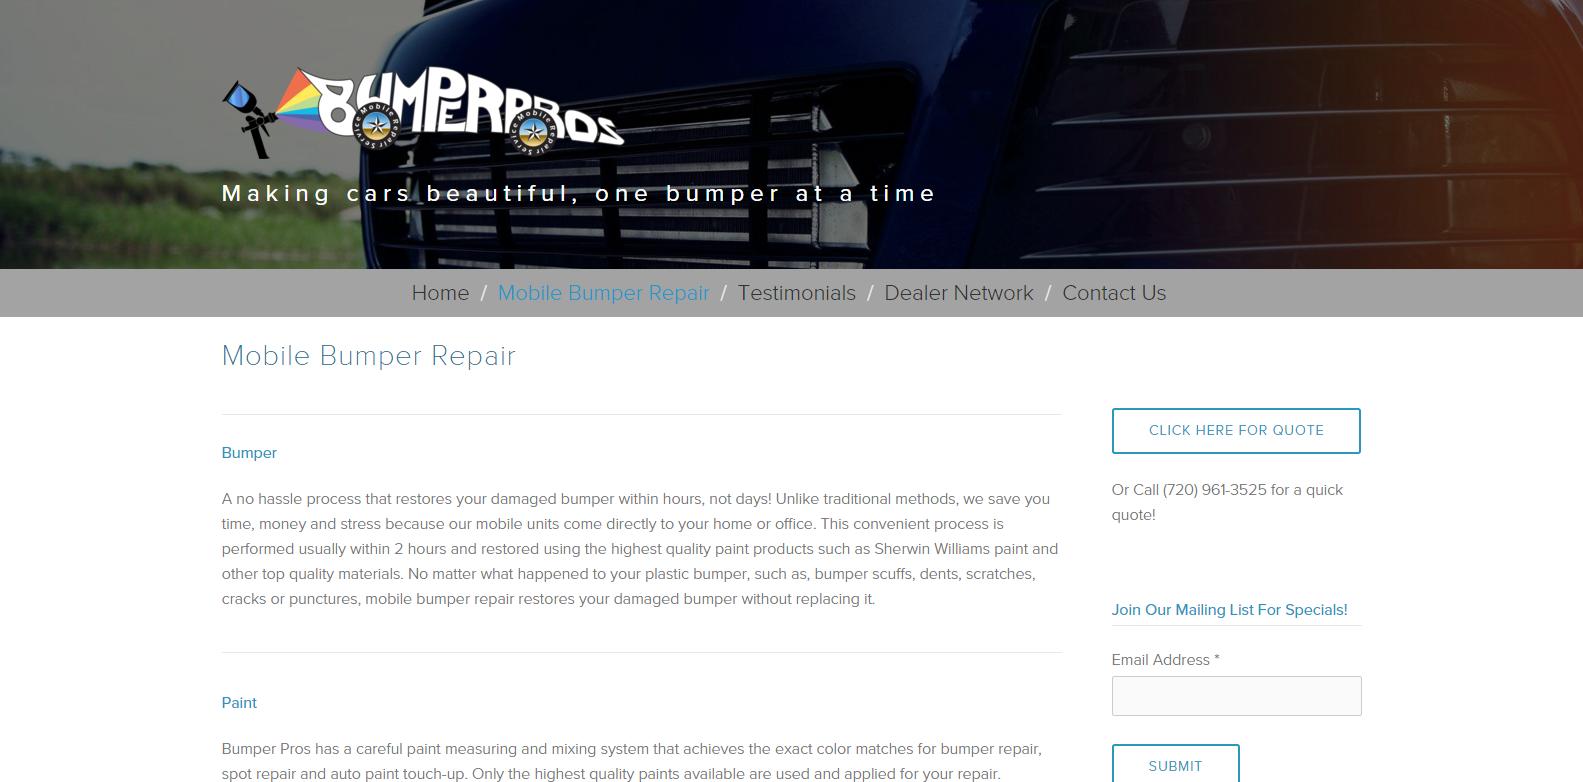 Bumper Pros Website